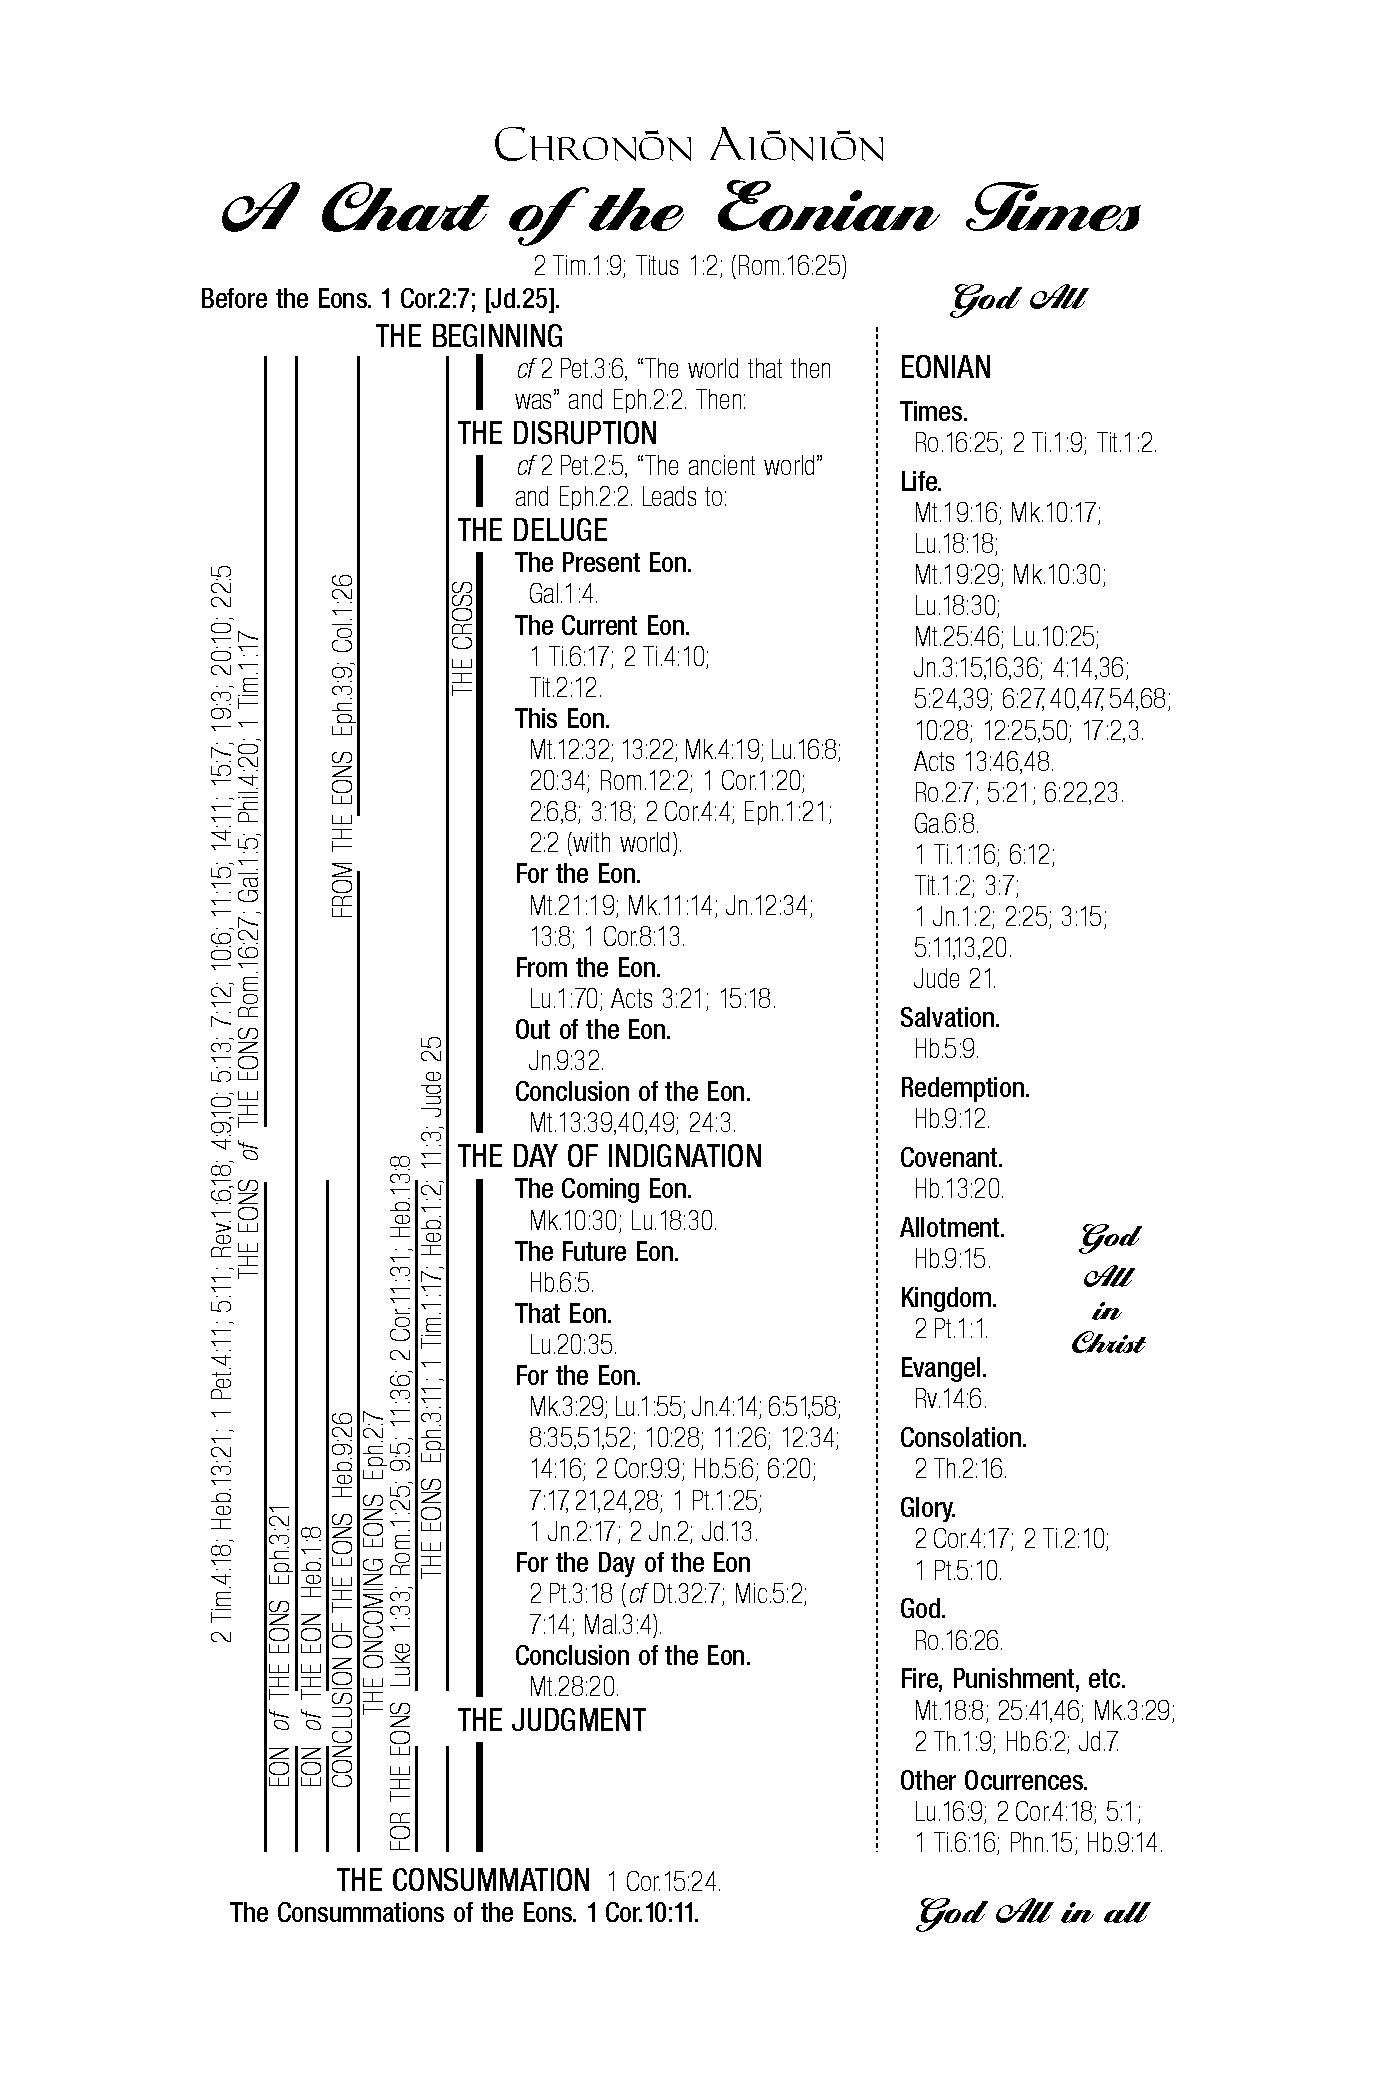 Eonian Times Chart